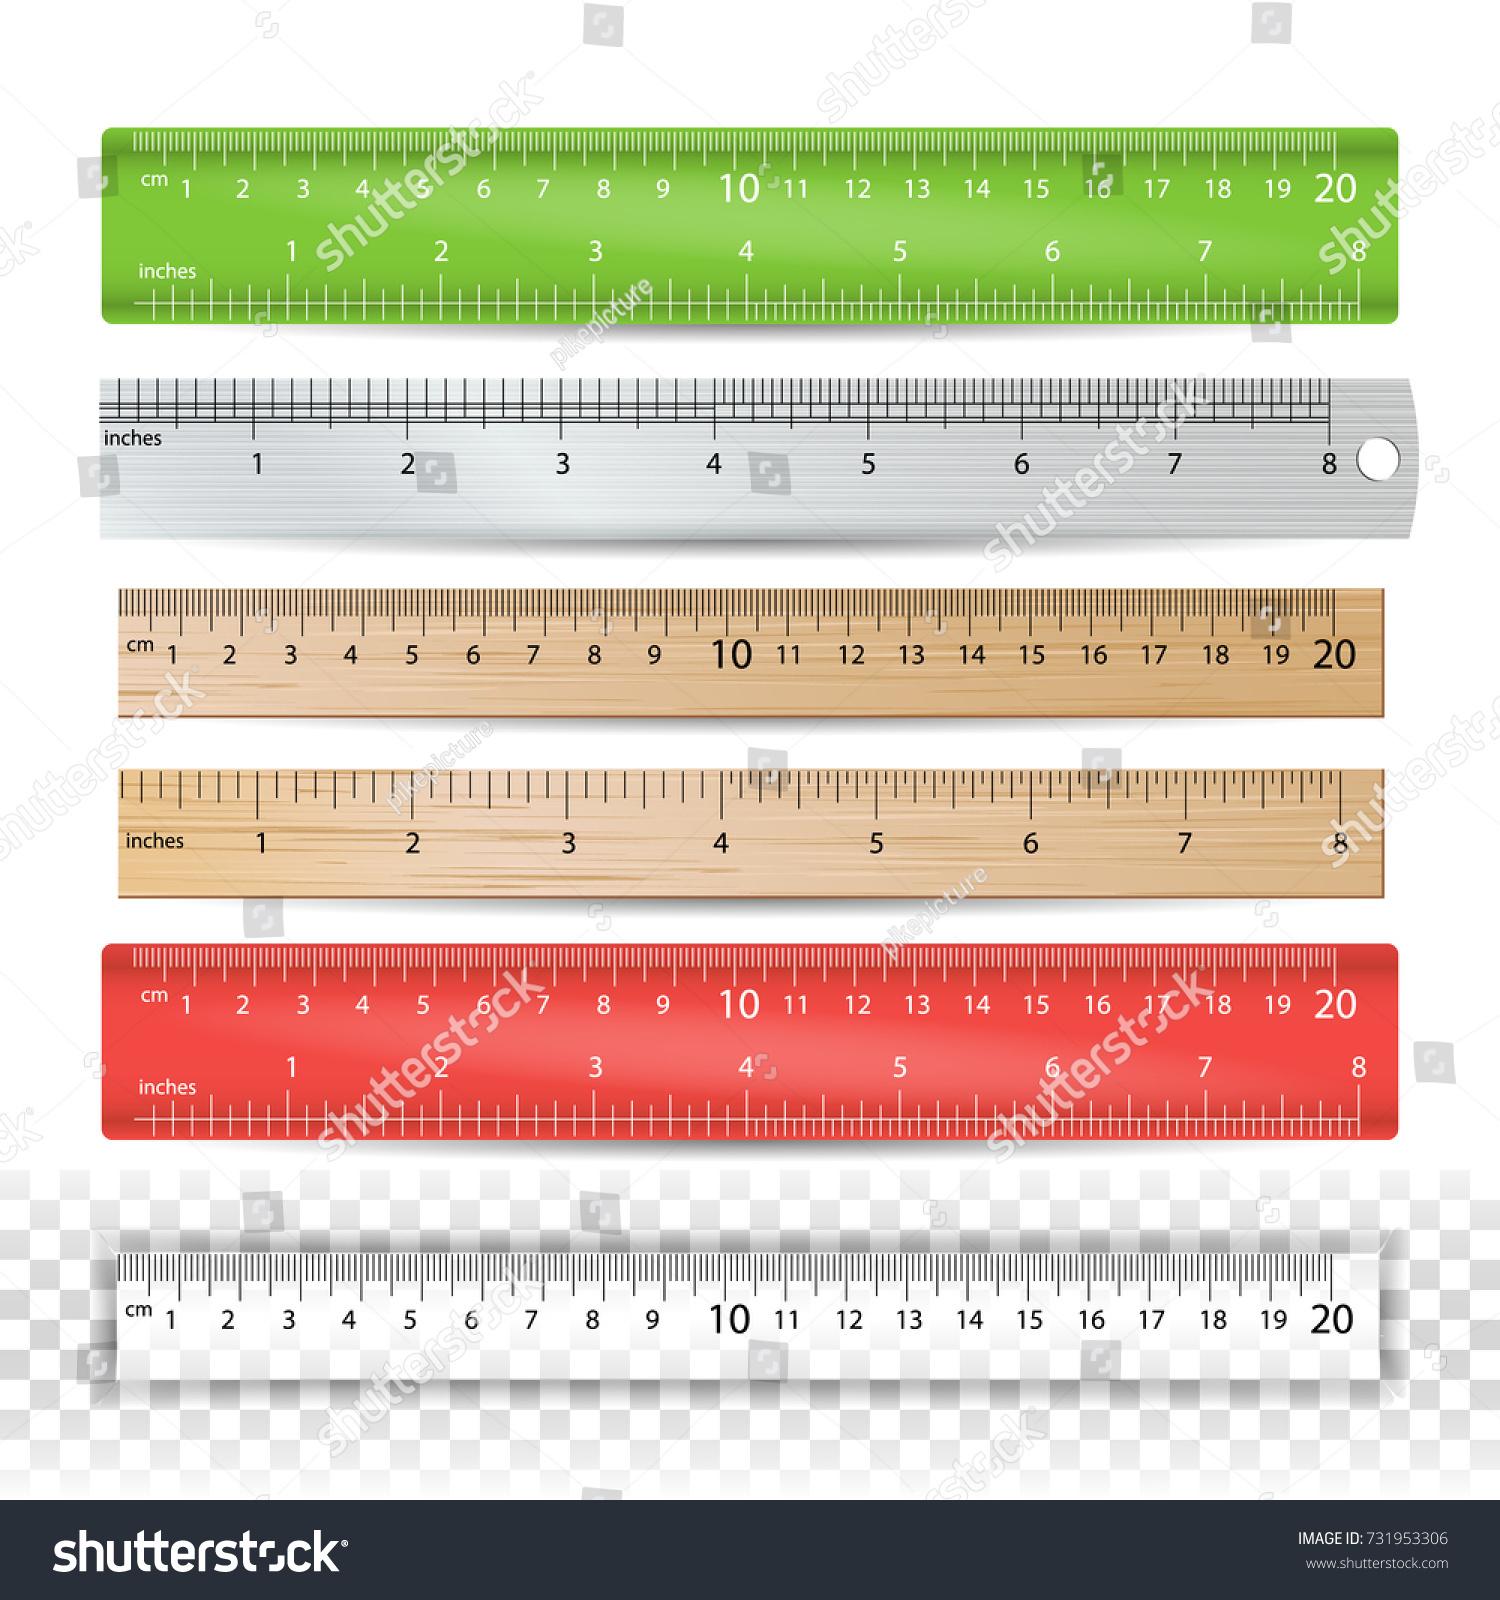 Worksheet Measuring With Centimeters Worksheet Fun